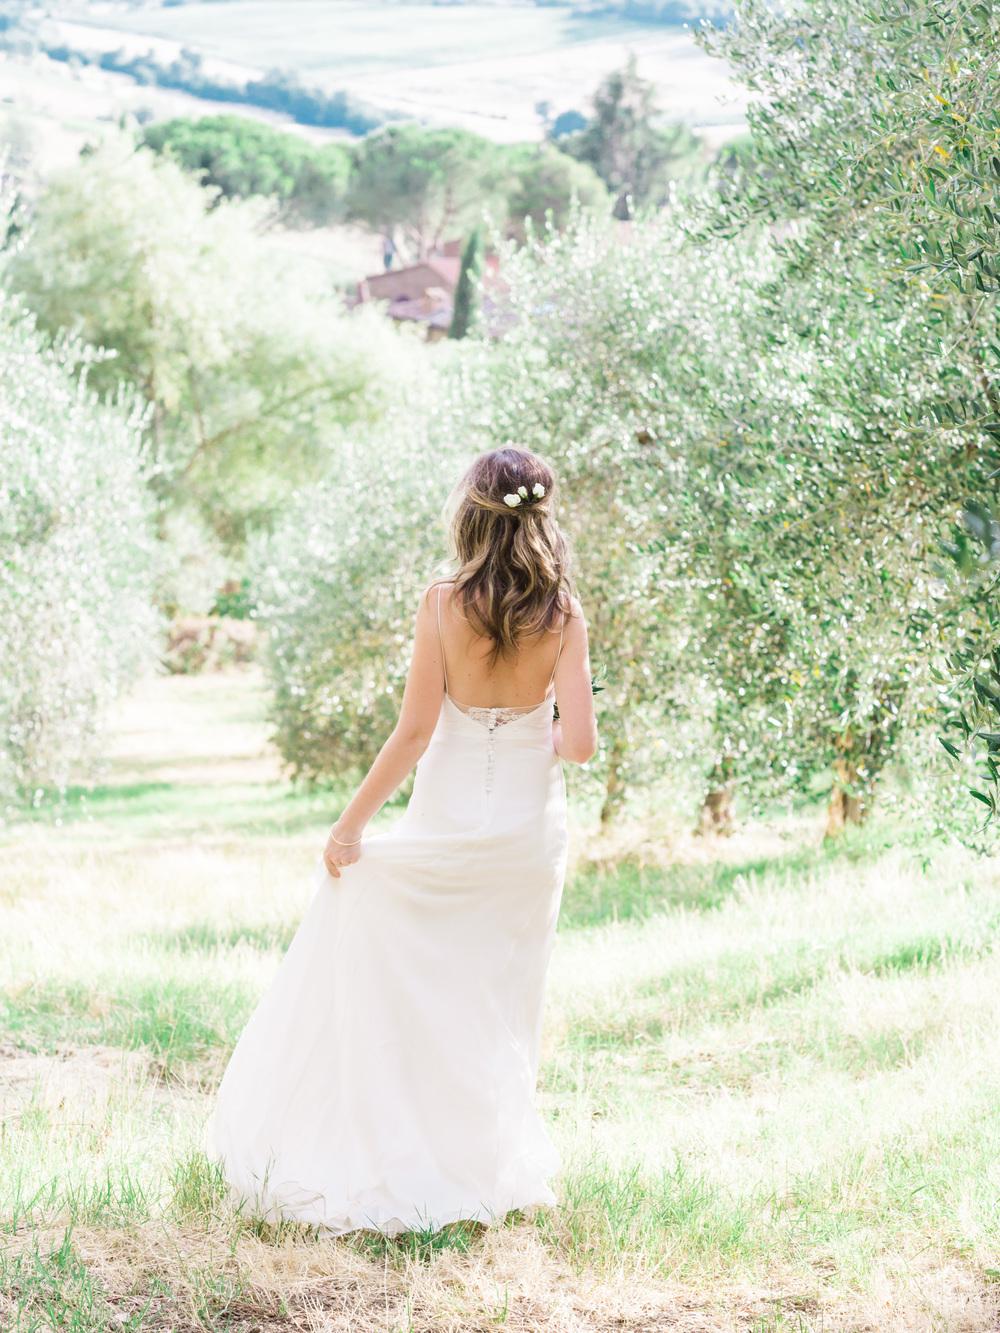 Blanccoco_Photographe_CF_Wedding_Italy_Tuscany_Fattoria_di_Cinciano-595.jpg